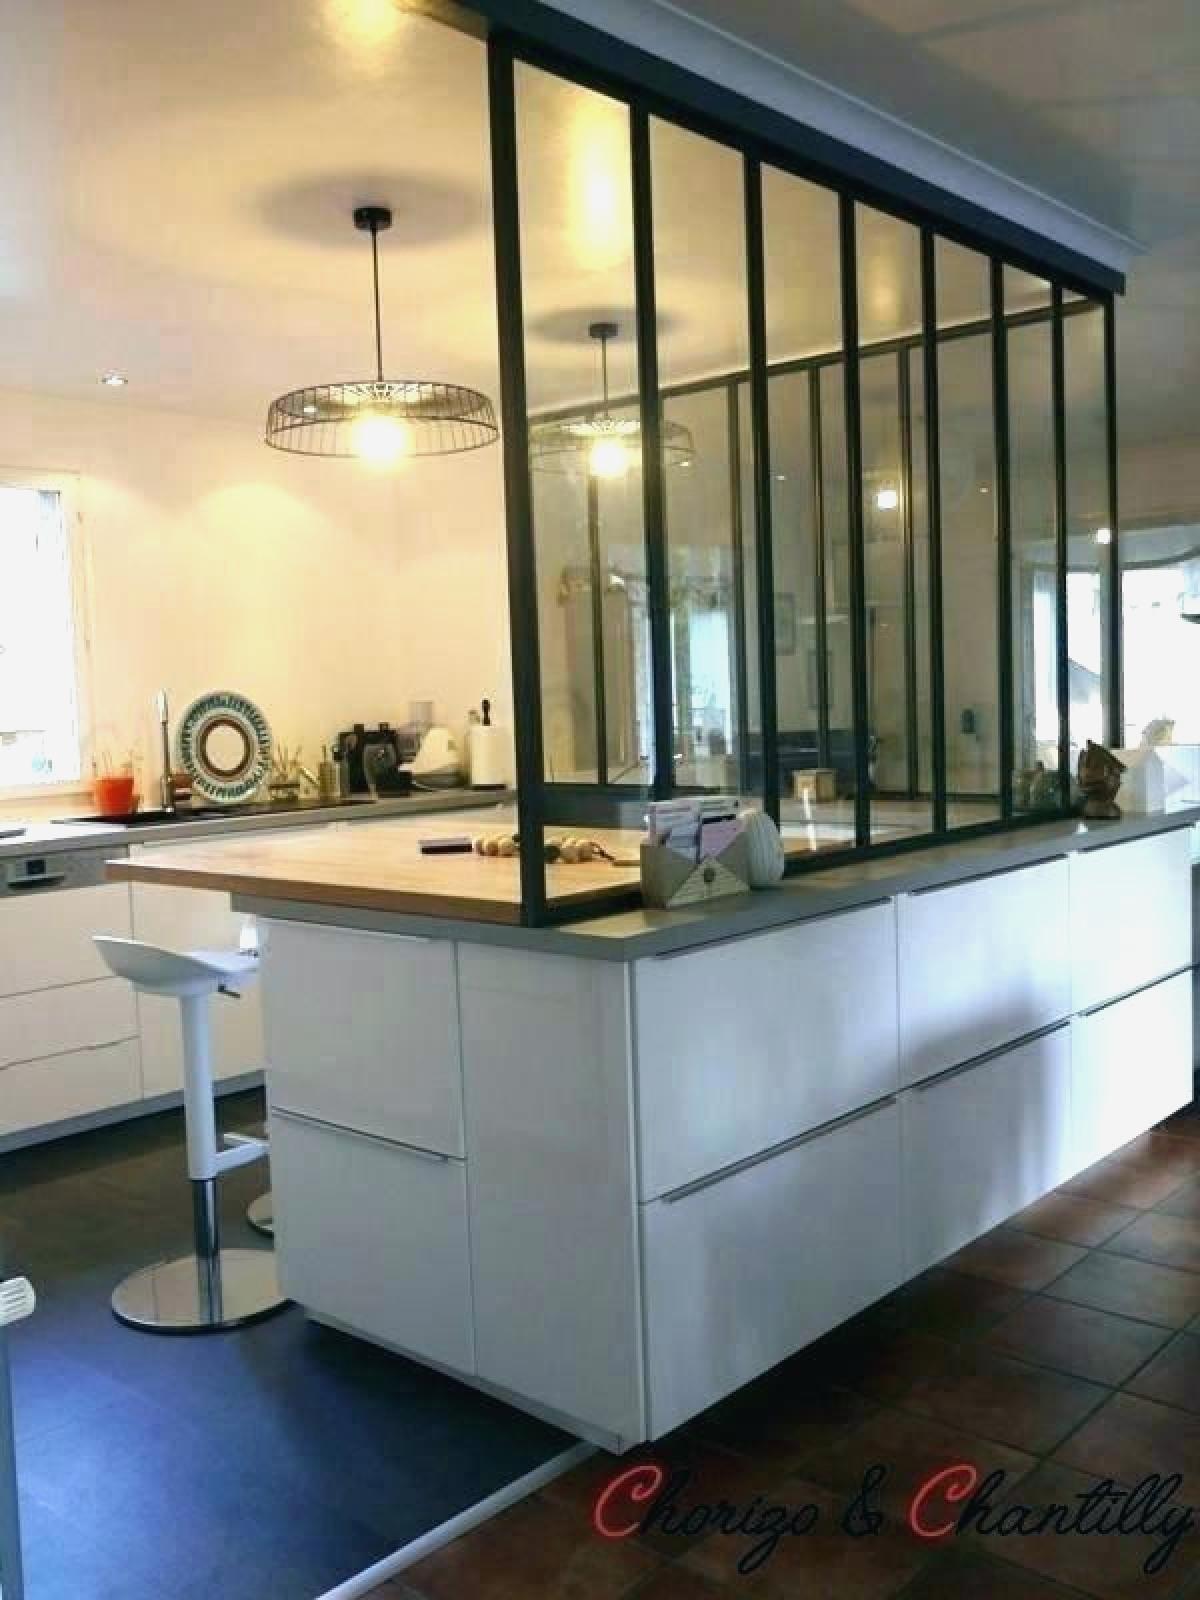 Rangement Interieur Cuisine Ikea Venus Et Judes